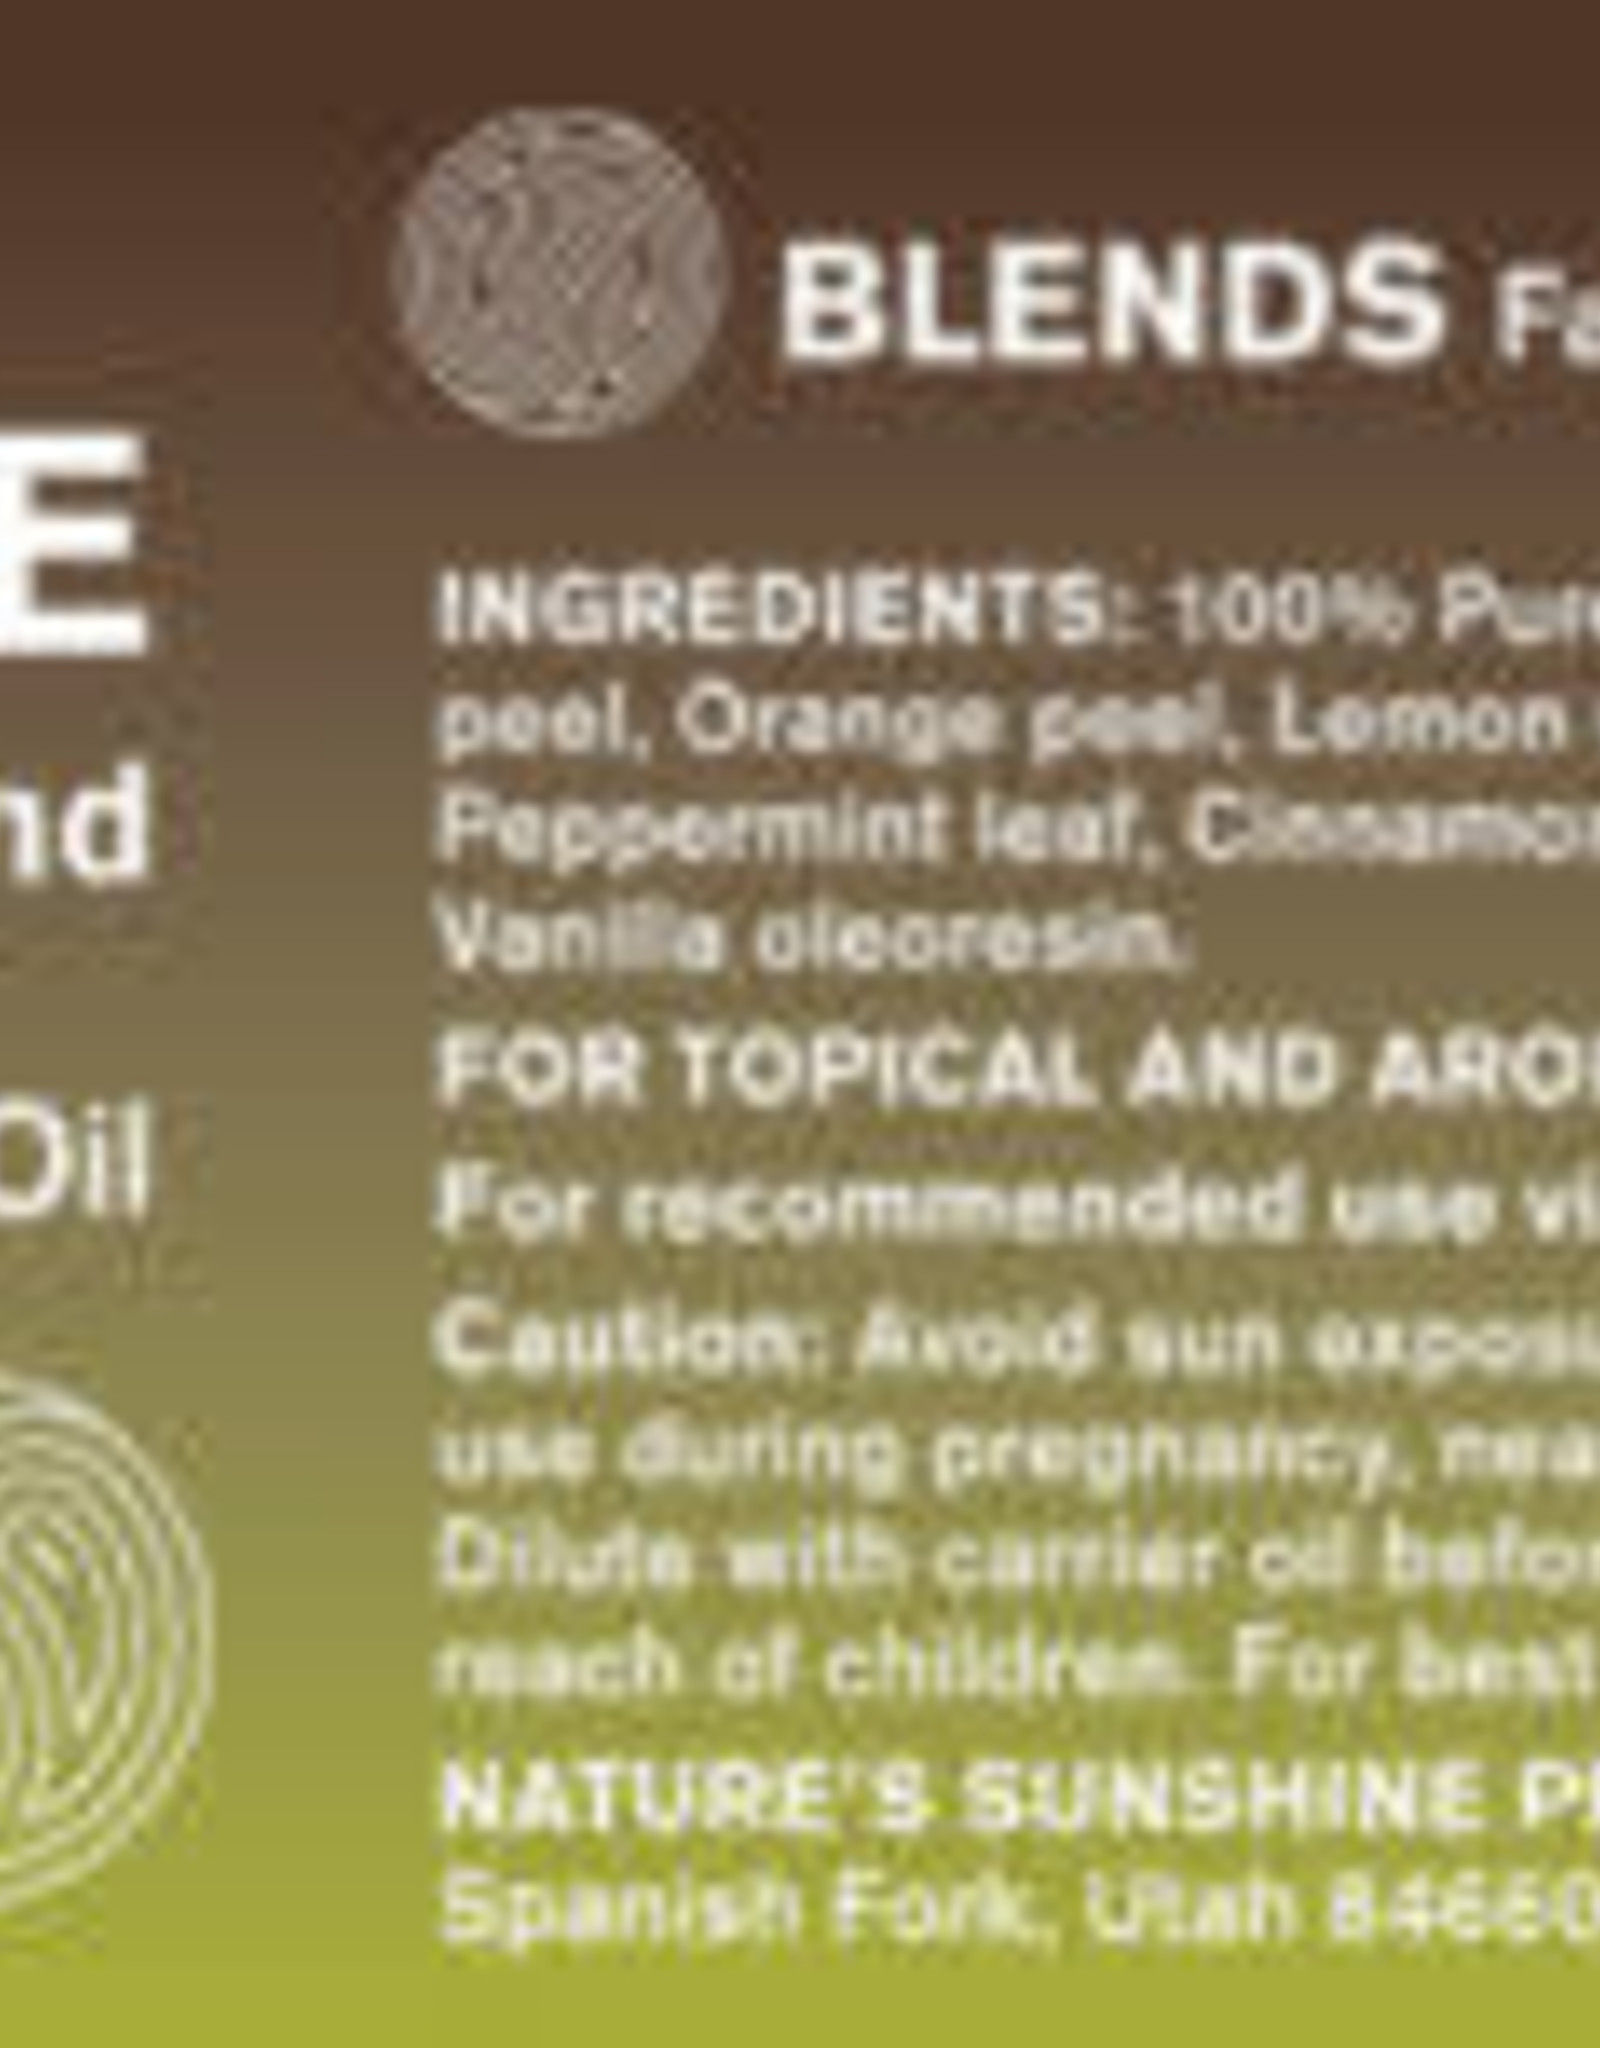 Nature's Sunshine Inspire Uplifting Oil Blend